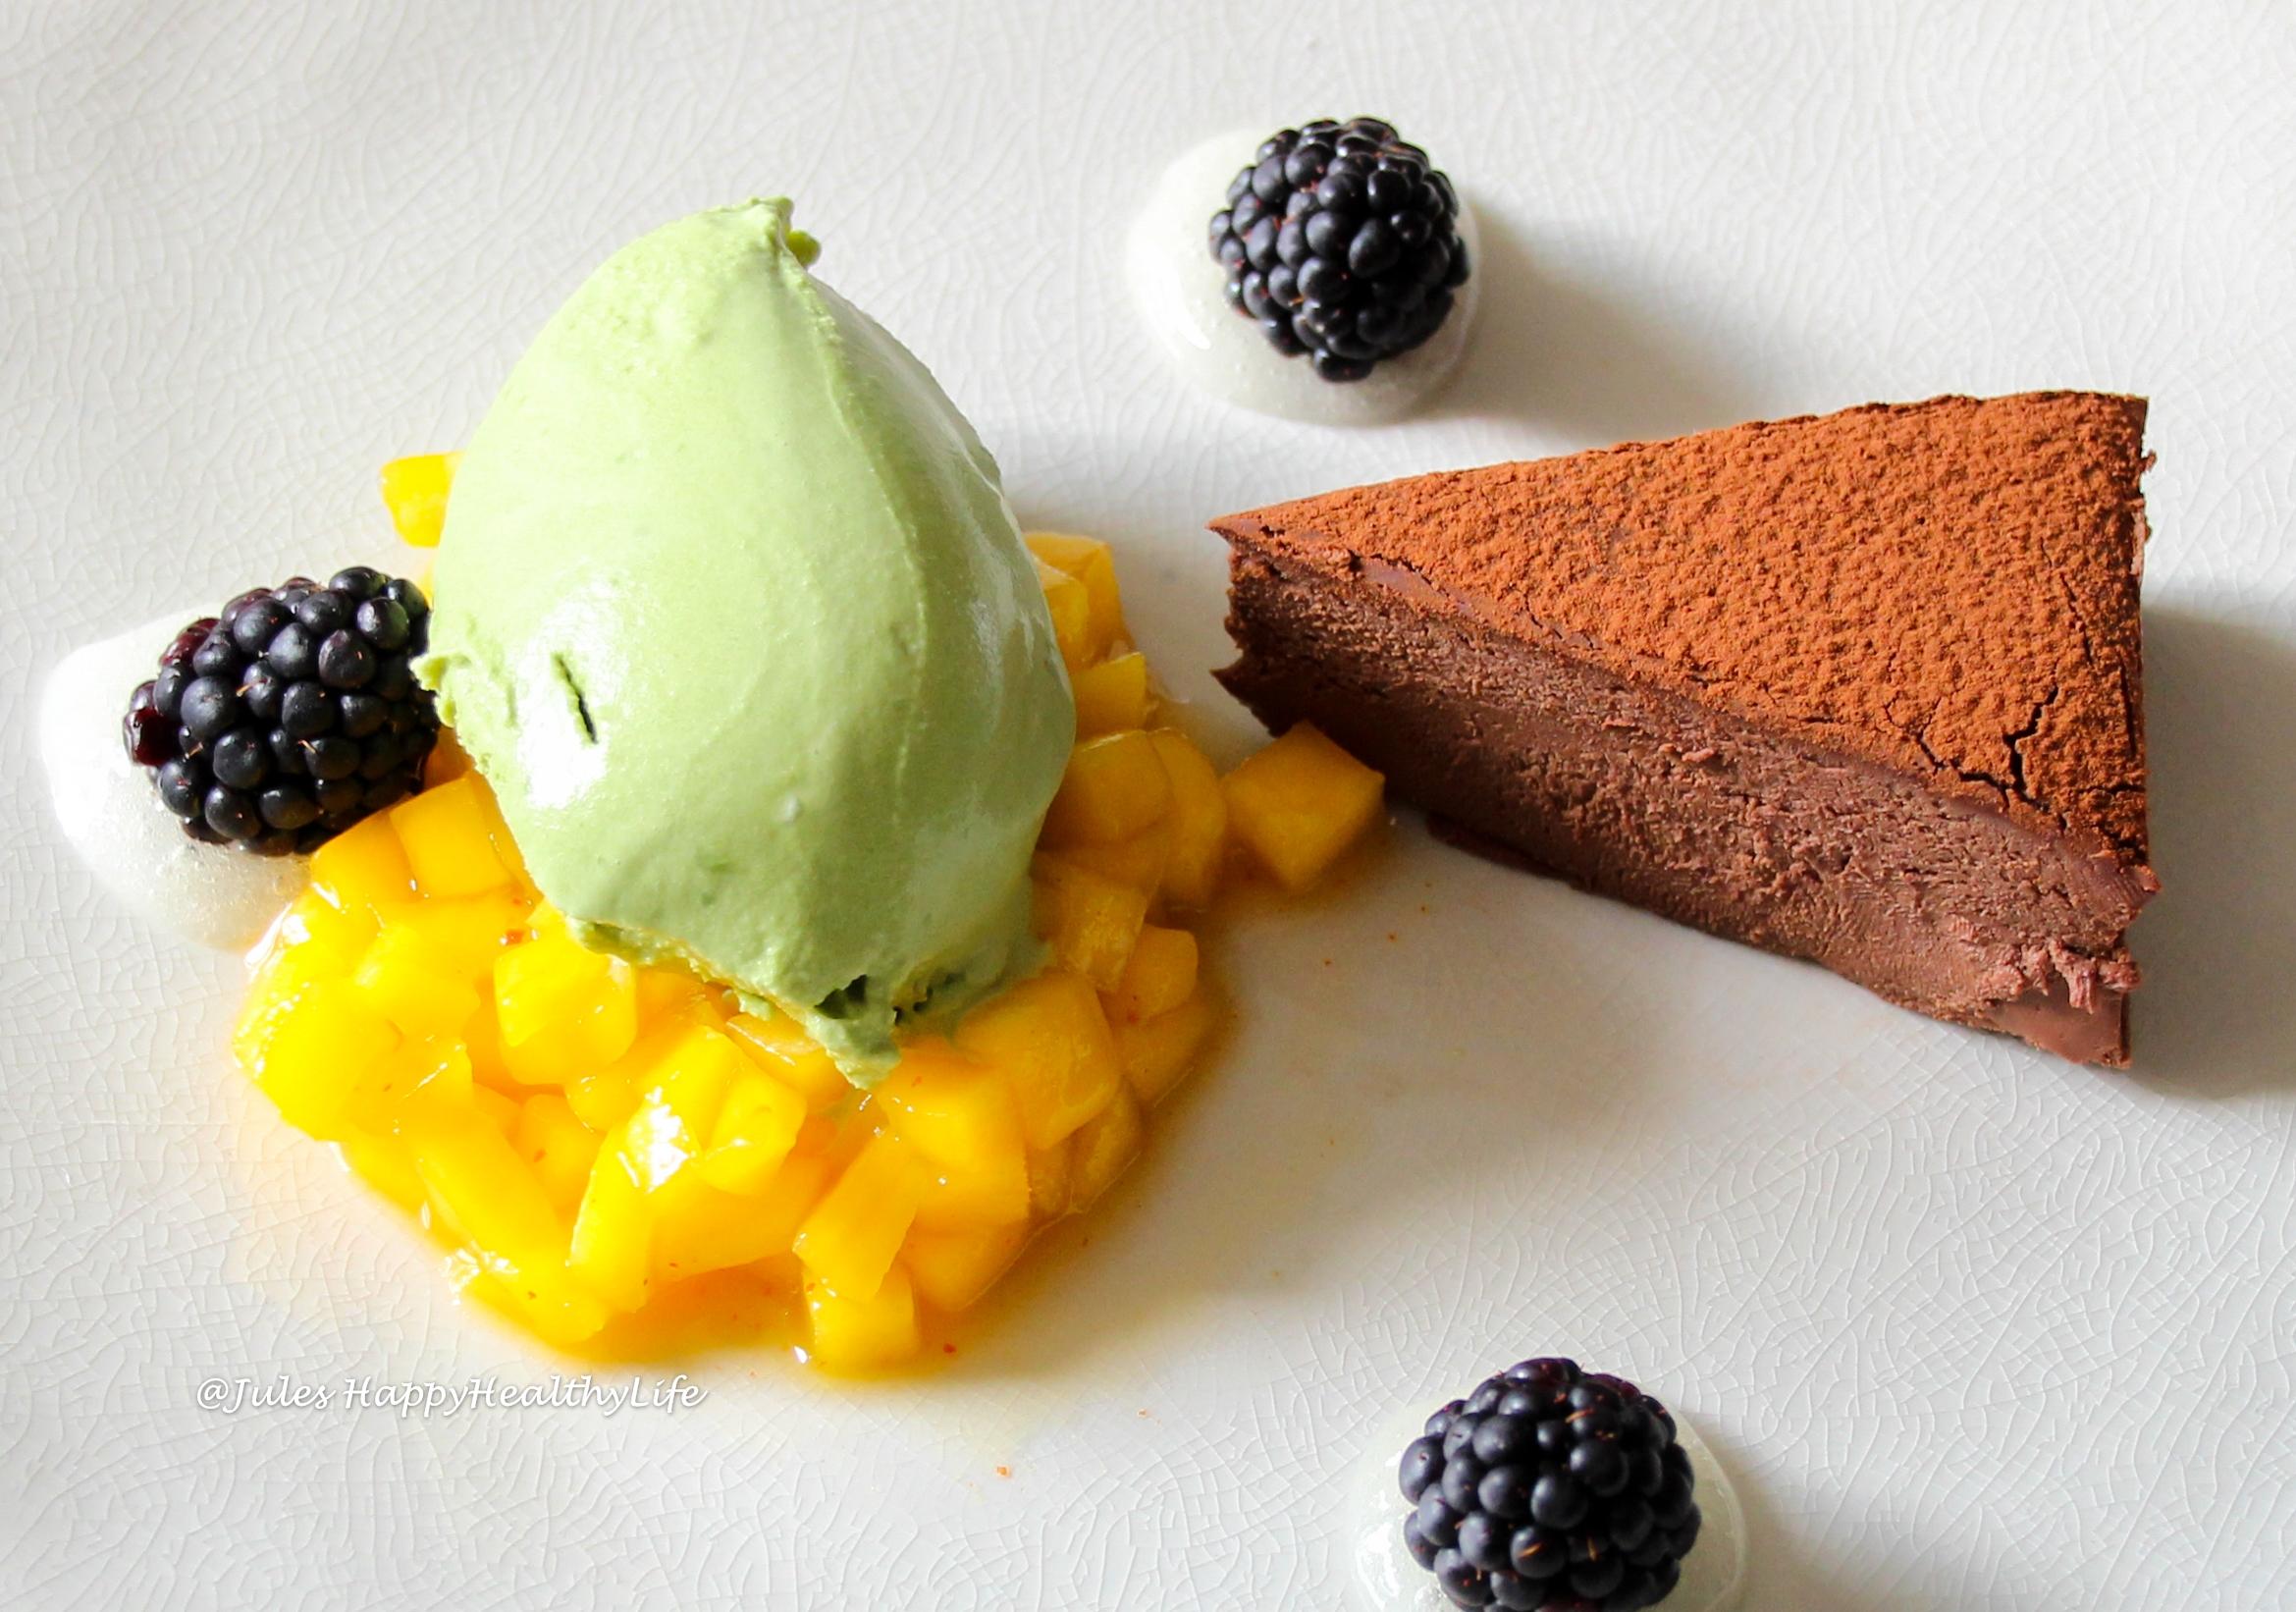 Yummy Matcha Ice Cream with Chocolate Ganache Tarte and Mango Chili Chutney and Lemon Gel